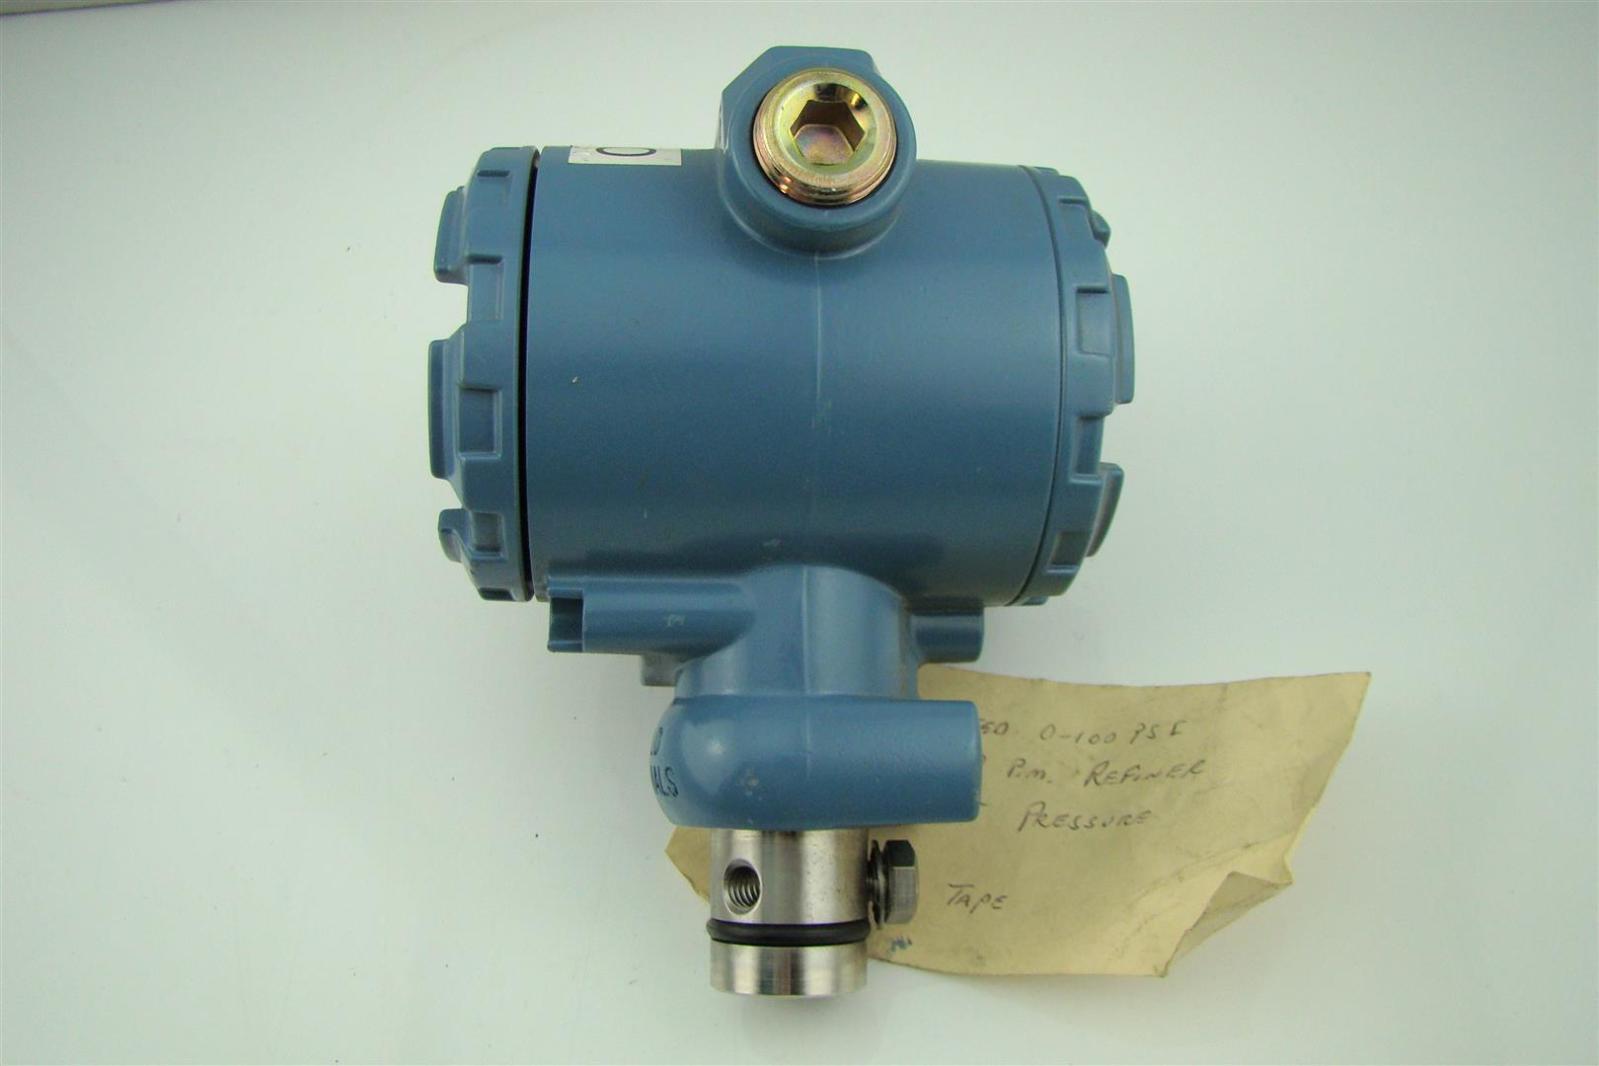 rosemount pressure transmitter wiring diagram 5 wire relay 2090 smart 150psi 36vdc